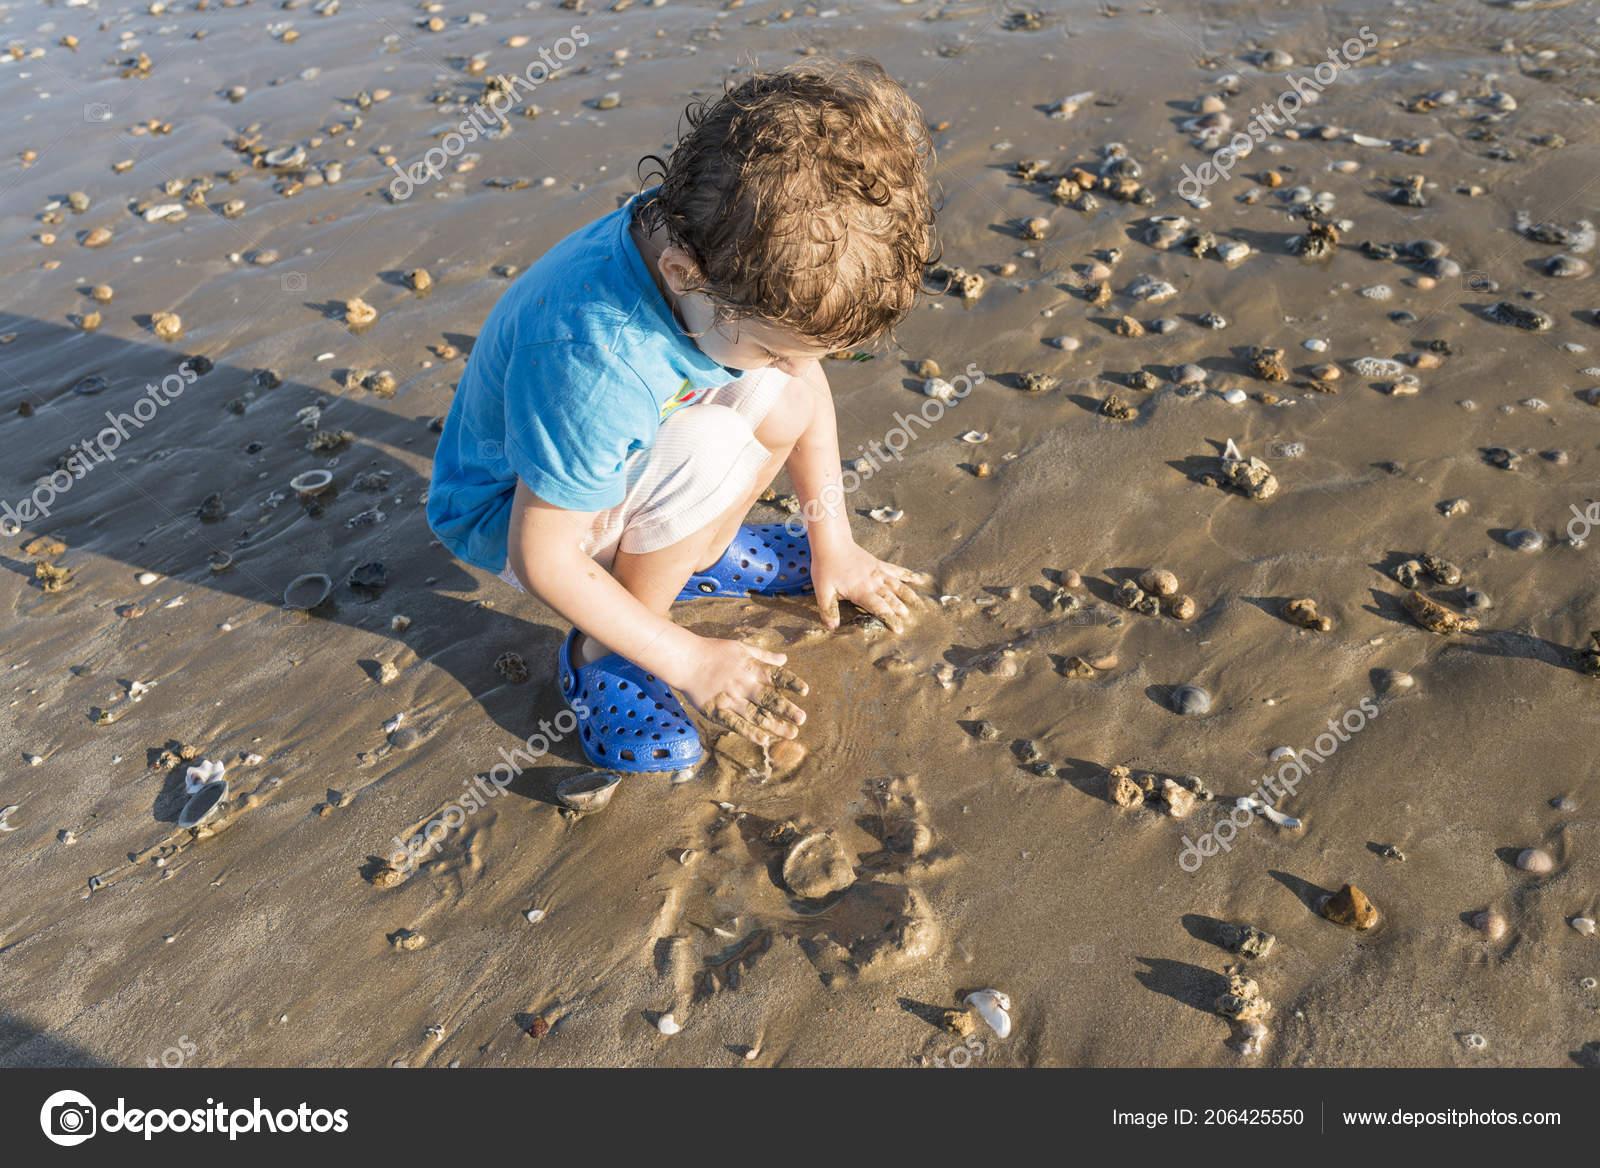 9e58a3175 Child Blue Shirt Playing Seashore Sand Shells — Stock Photo ...